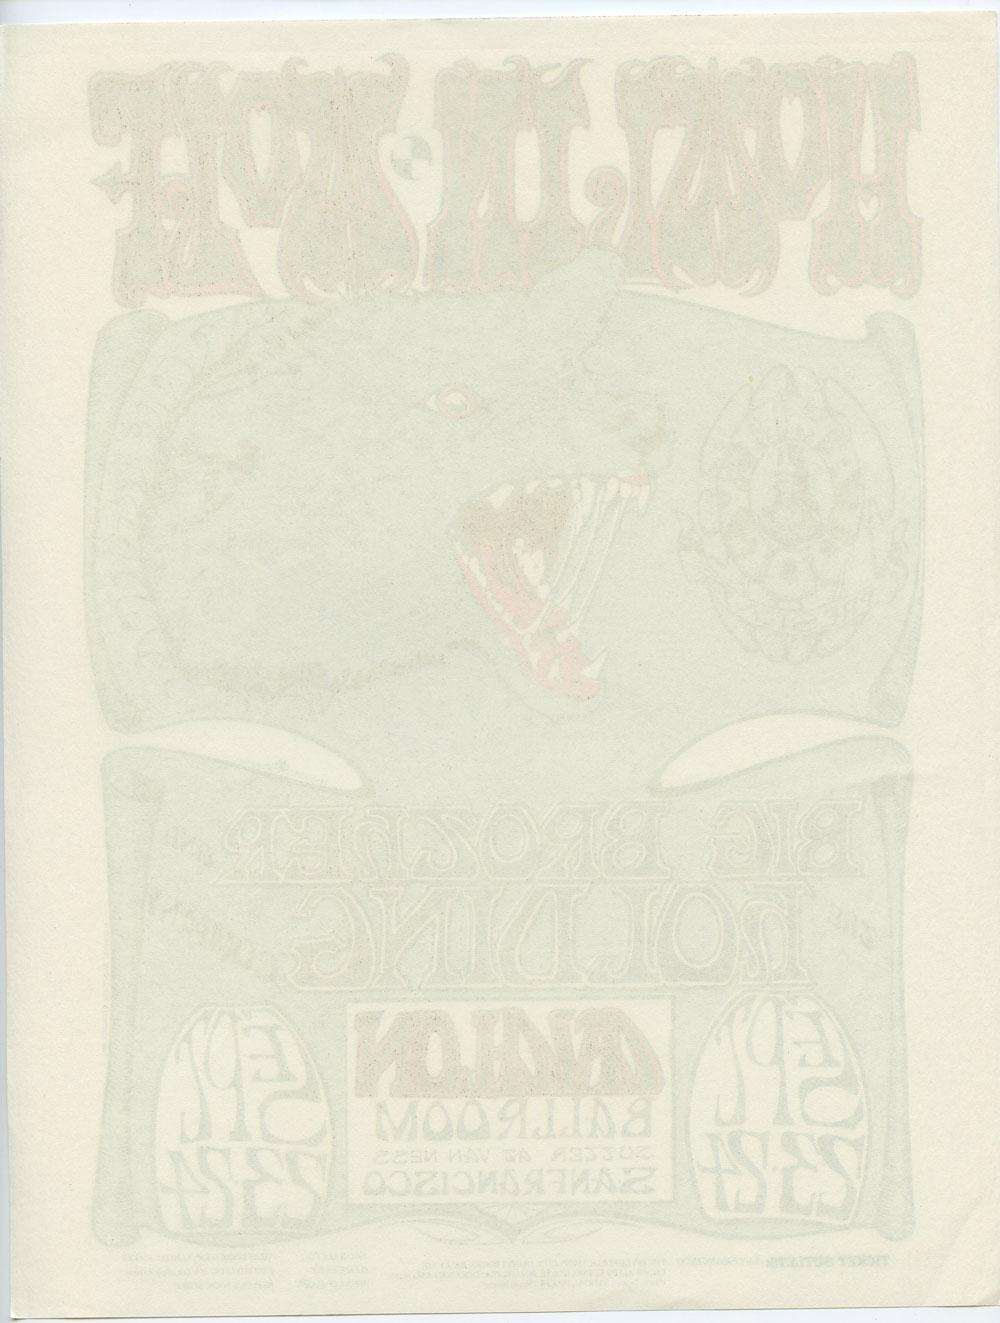 Family Dog 027 Handbill Howlin' Wolf  Big Brother & the Holding Co 1966 Sep 23